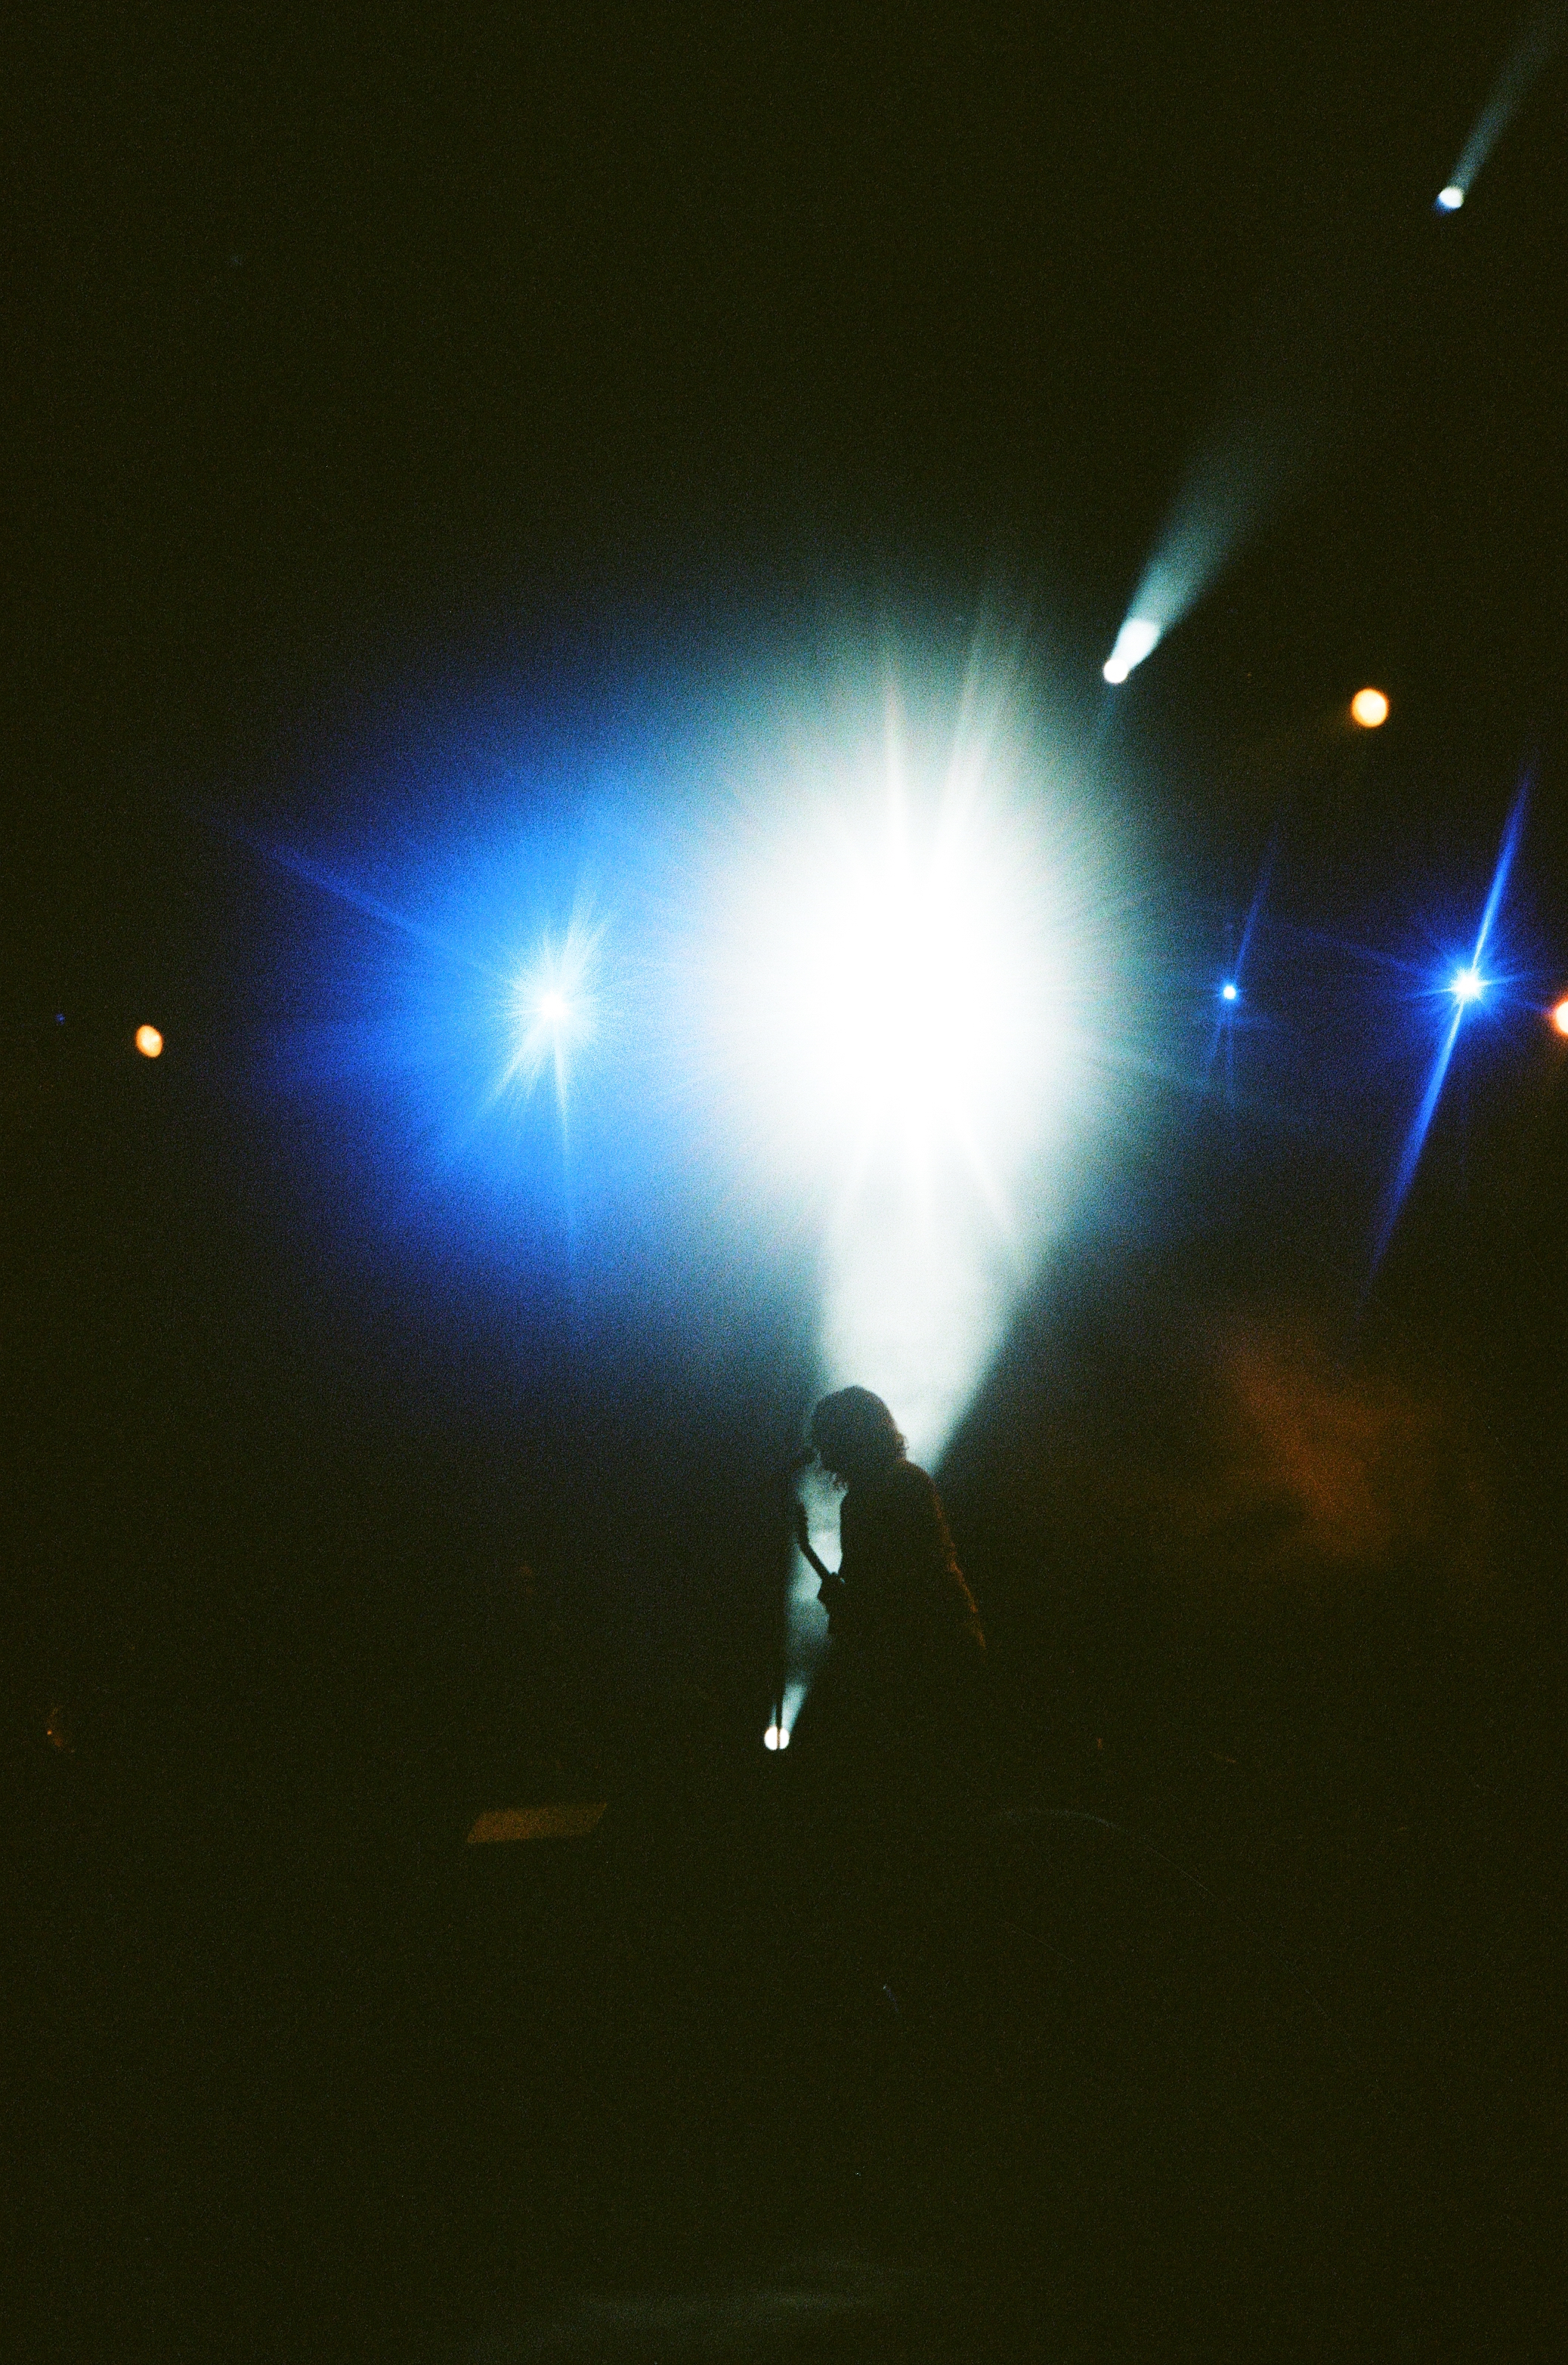 Ty Segall at Primavera ☻ Barcelona, Spain